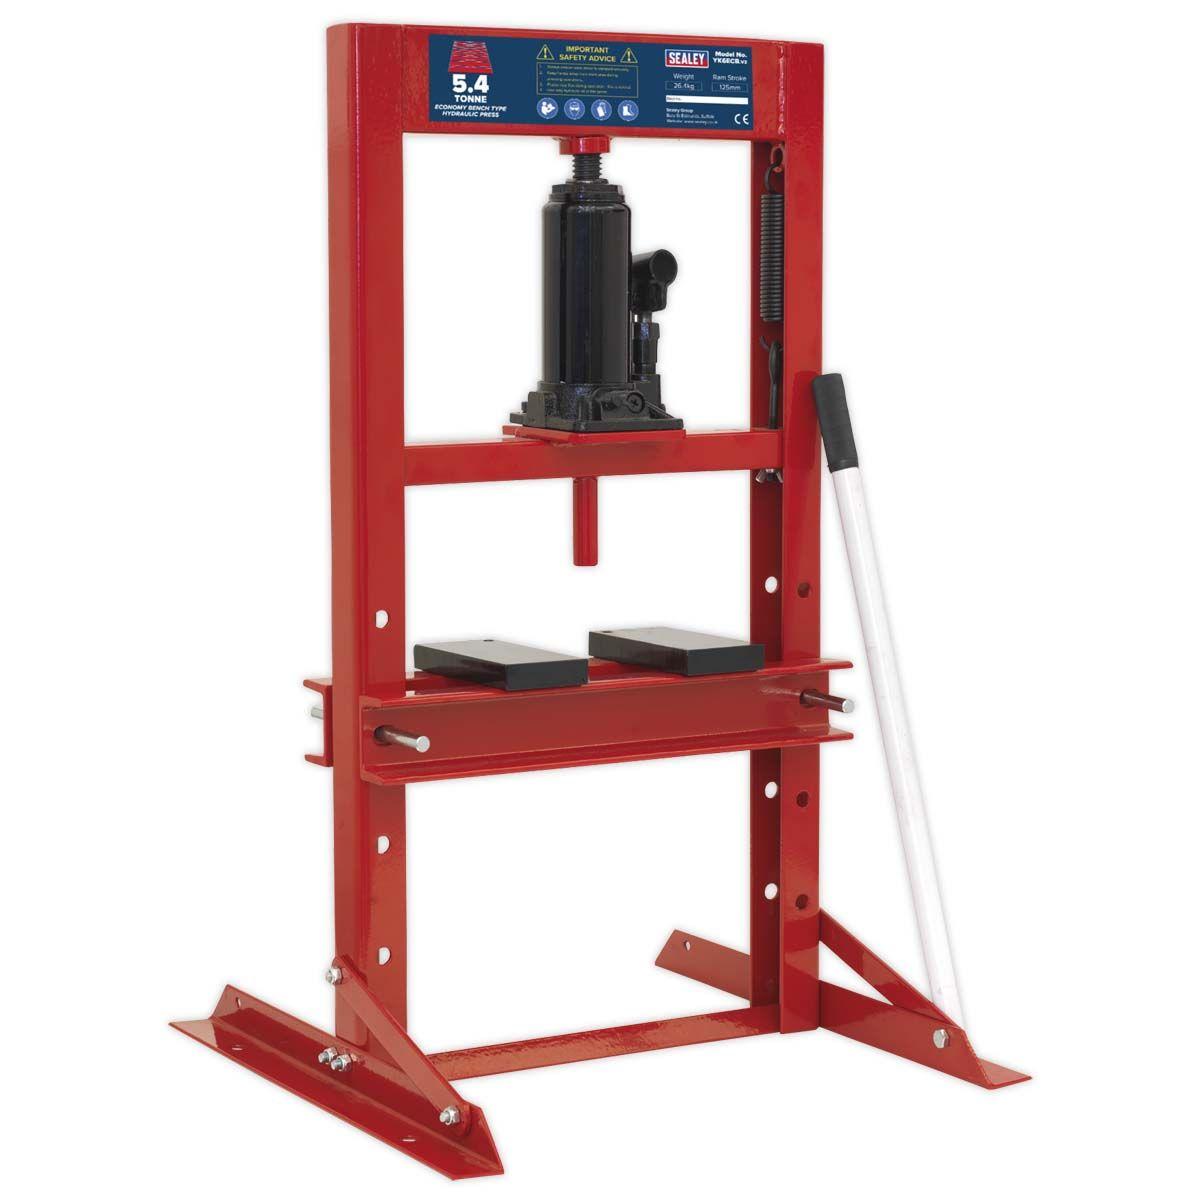 Sealey Hydraulic Press 5.4tonne Economy Bench Type